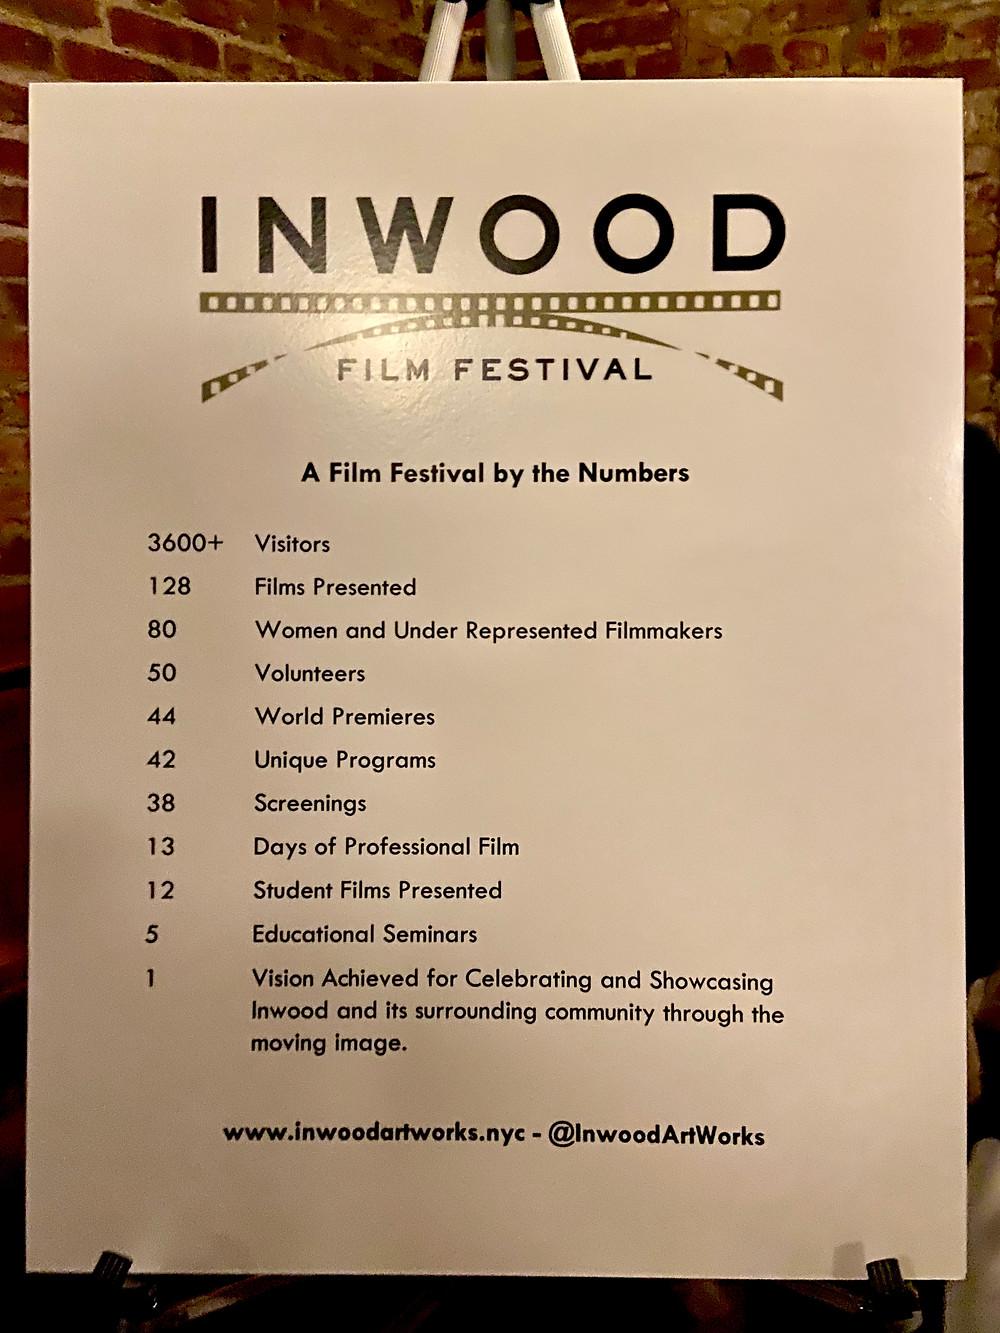 Inwood Film Festival stats